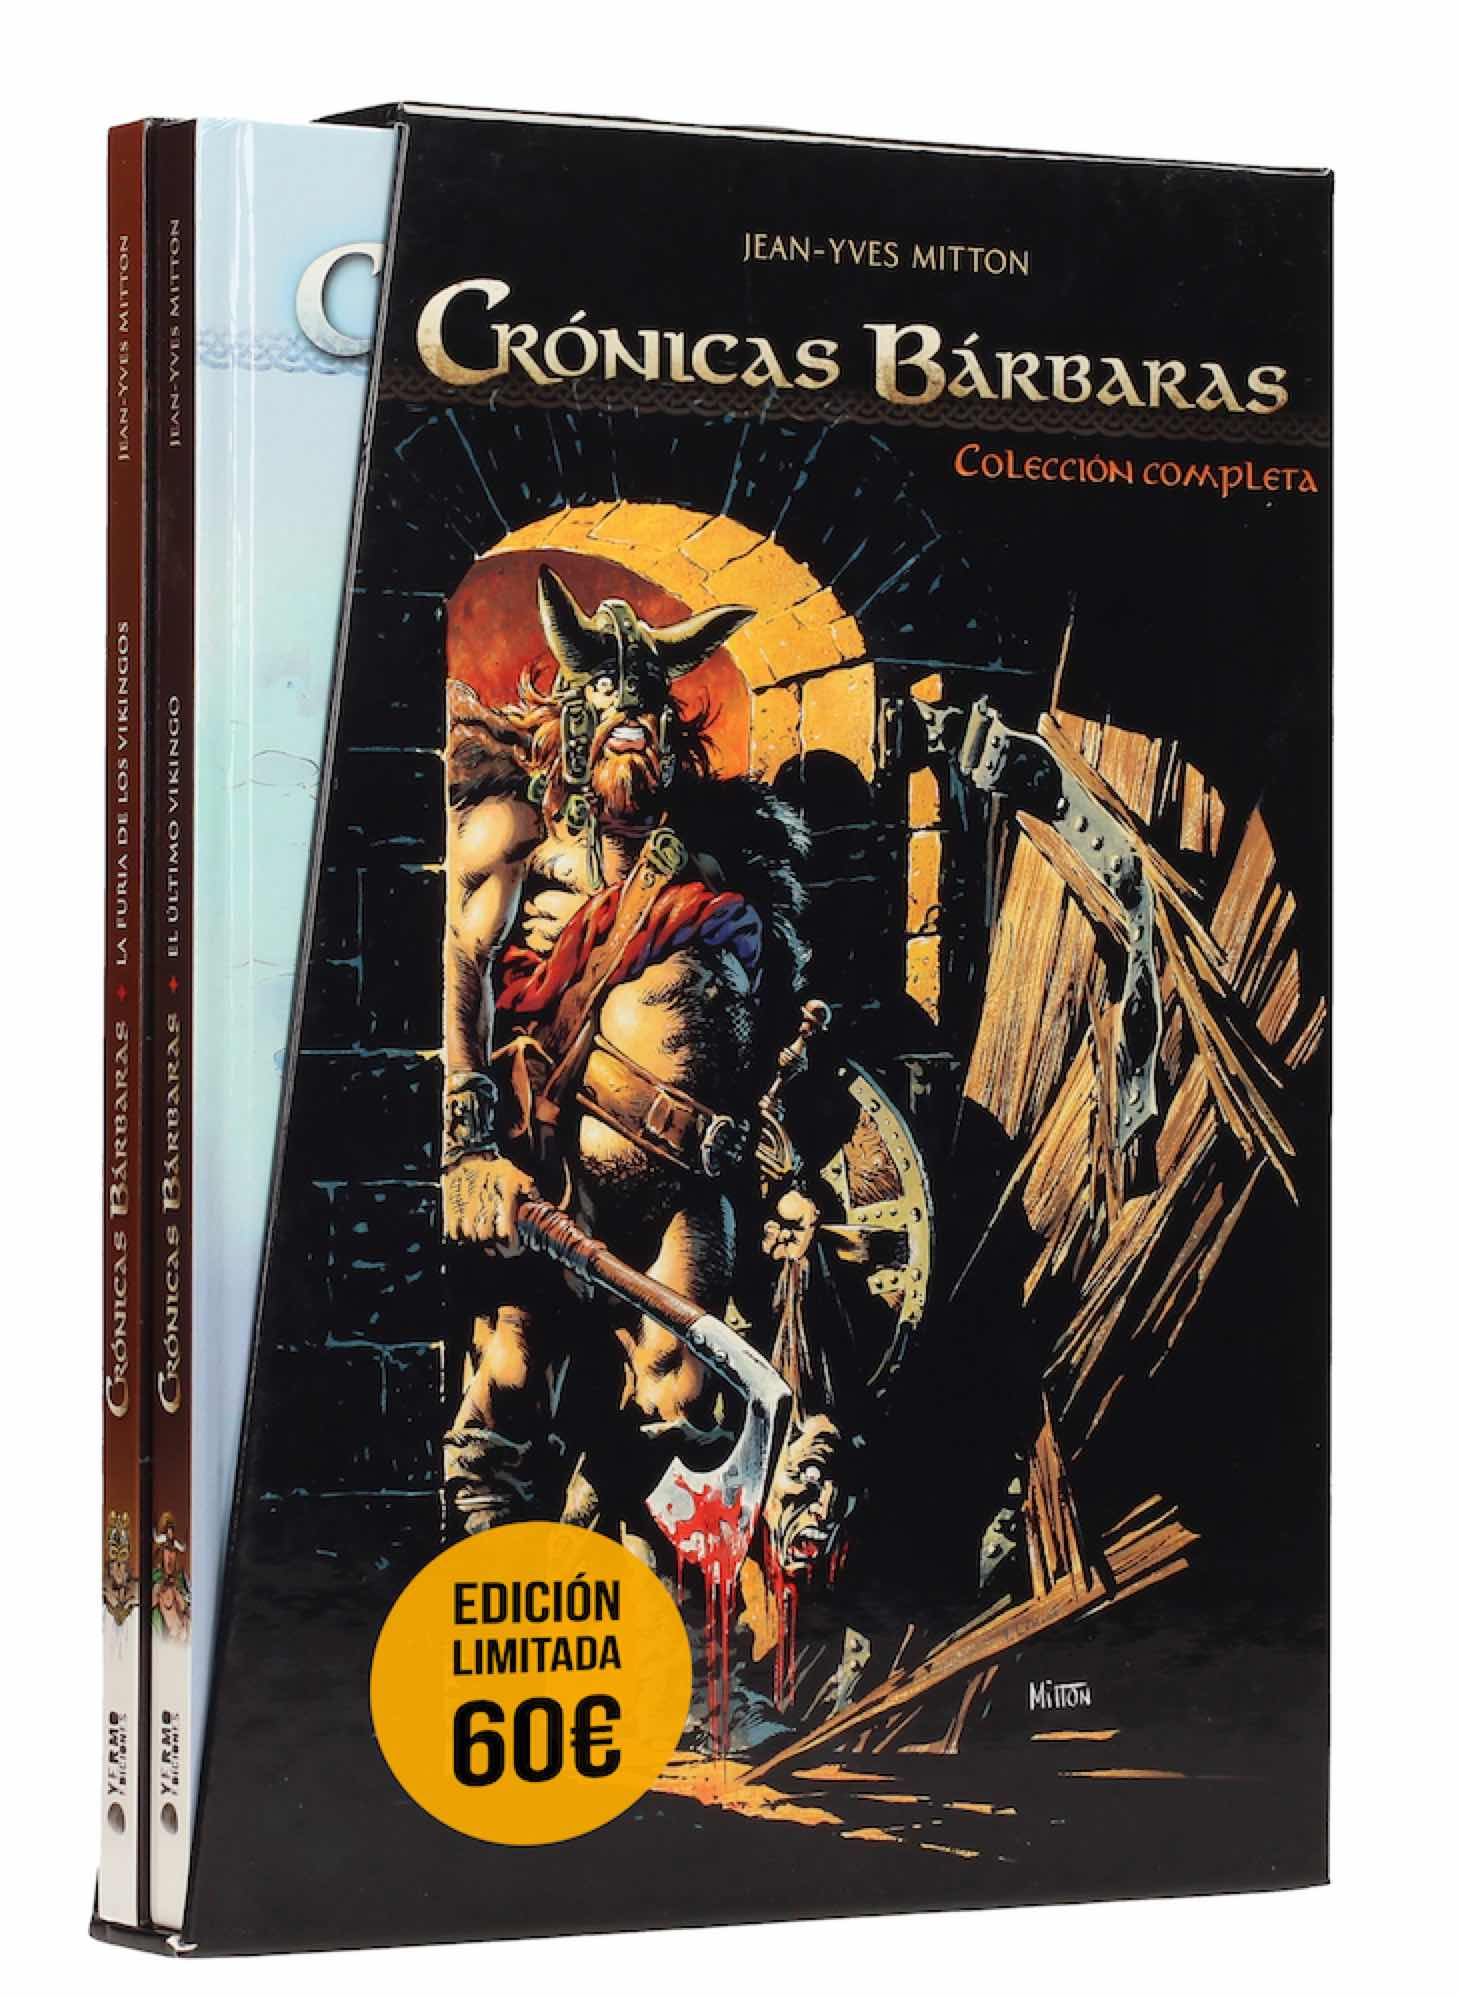 COFRE CRONICAS BARBARAS